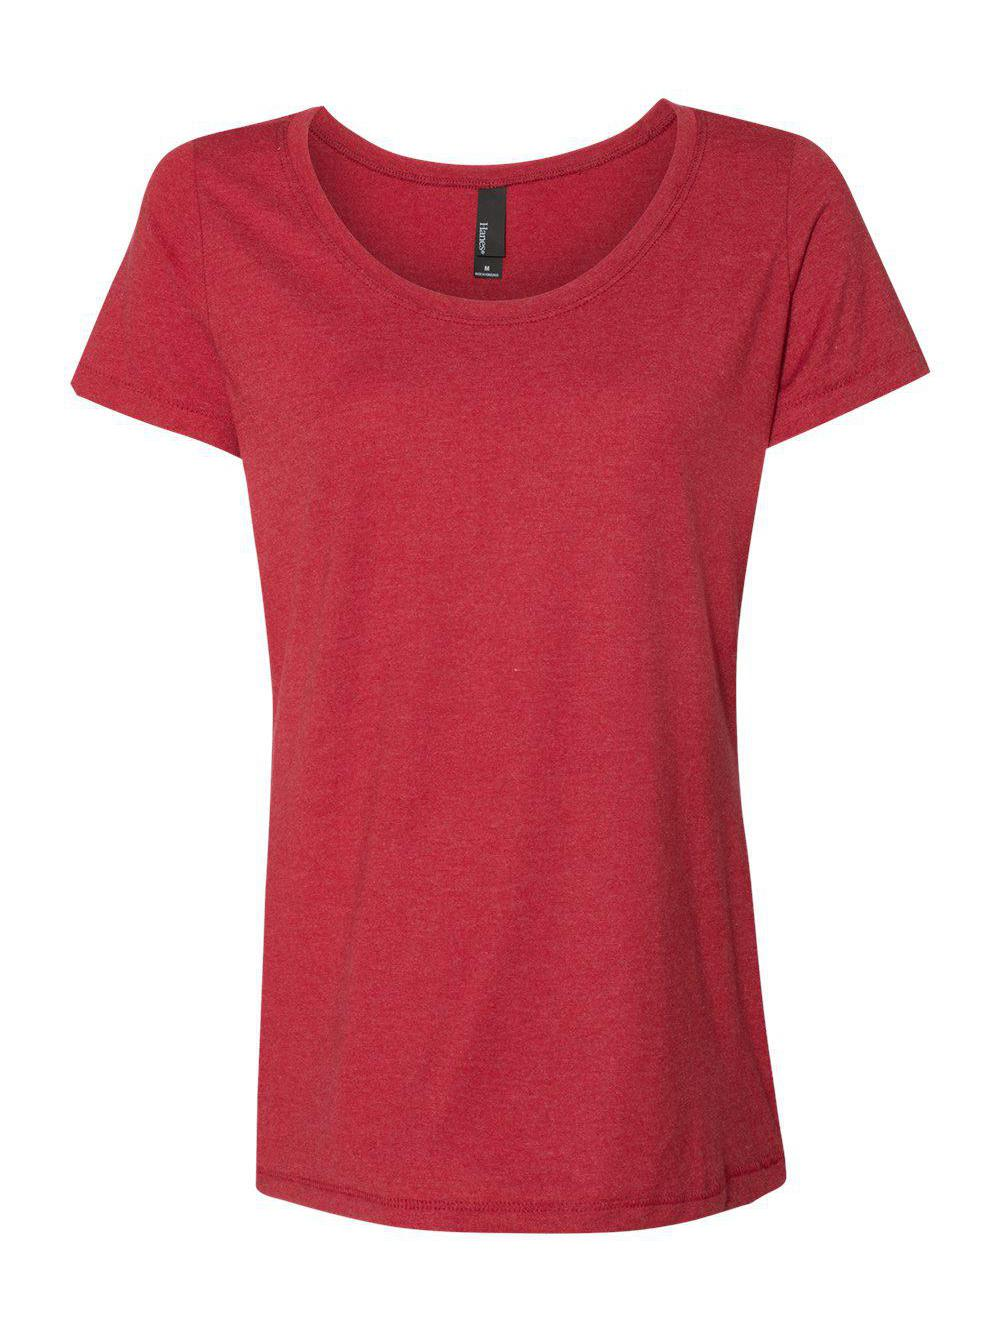 Hanes-Women-039-s-Modal-Triblend-T-Shirt-MO150 thumbnail 5